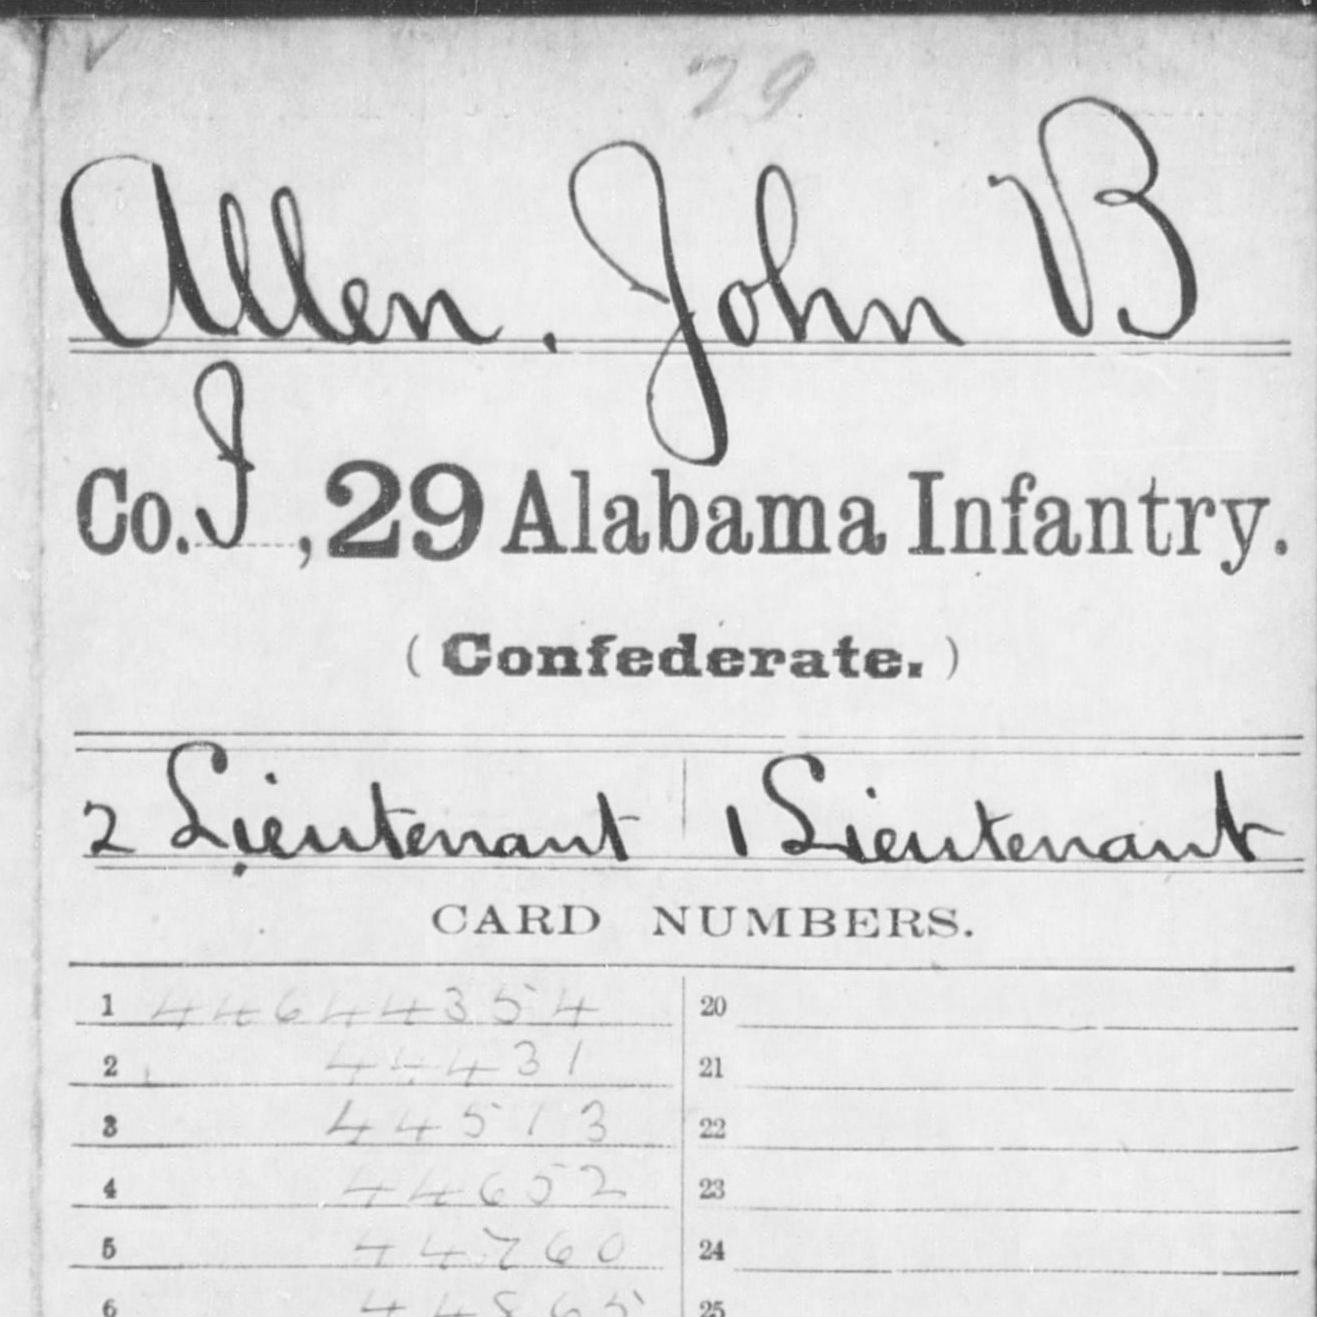 Capt. John Allen, Co. I, 29th AL Infantry, CSA